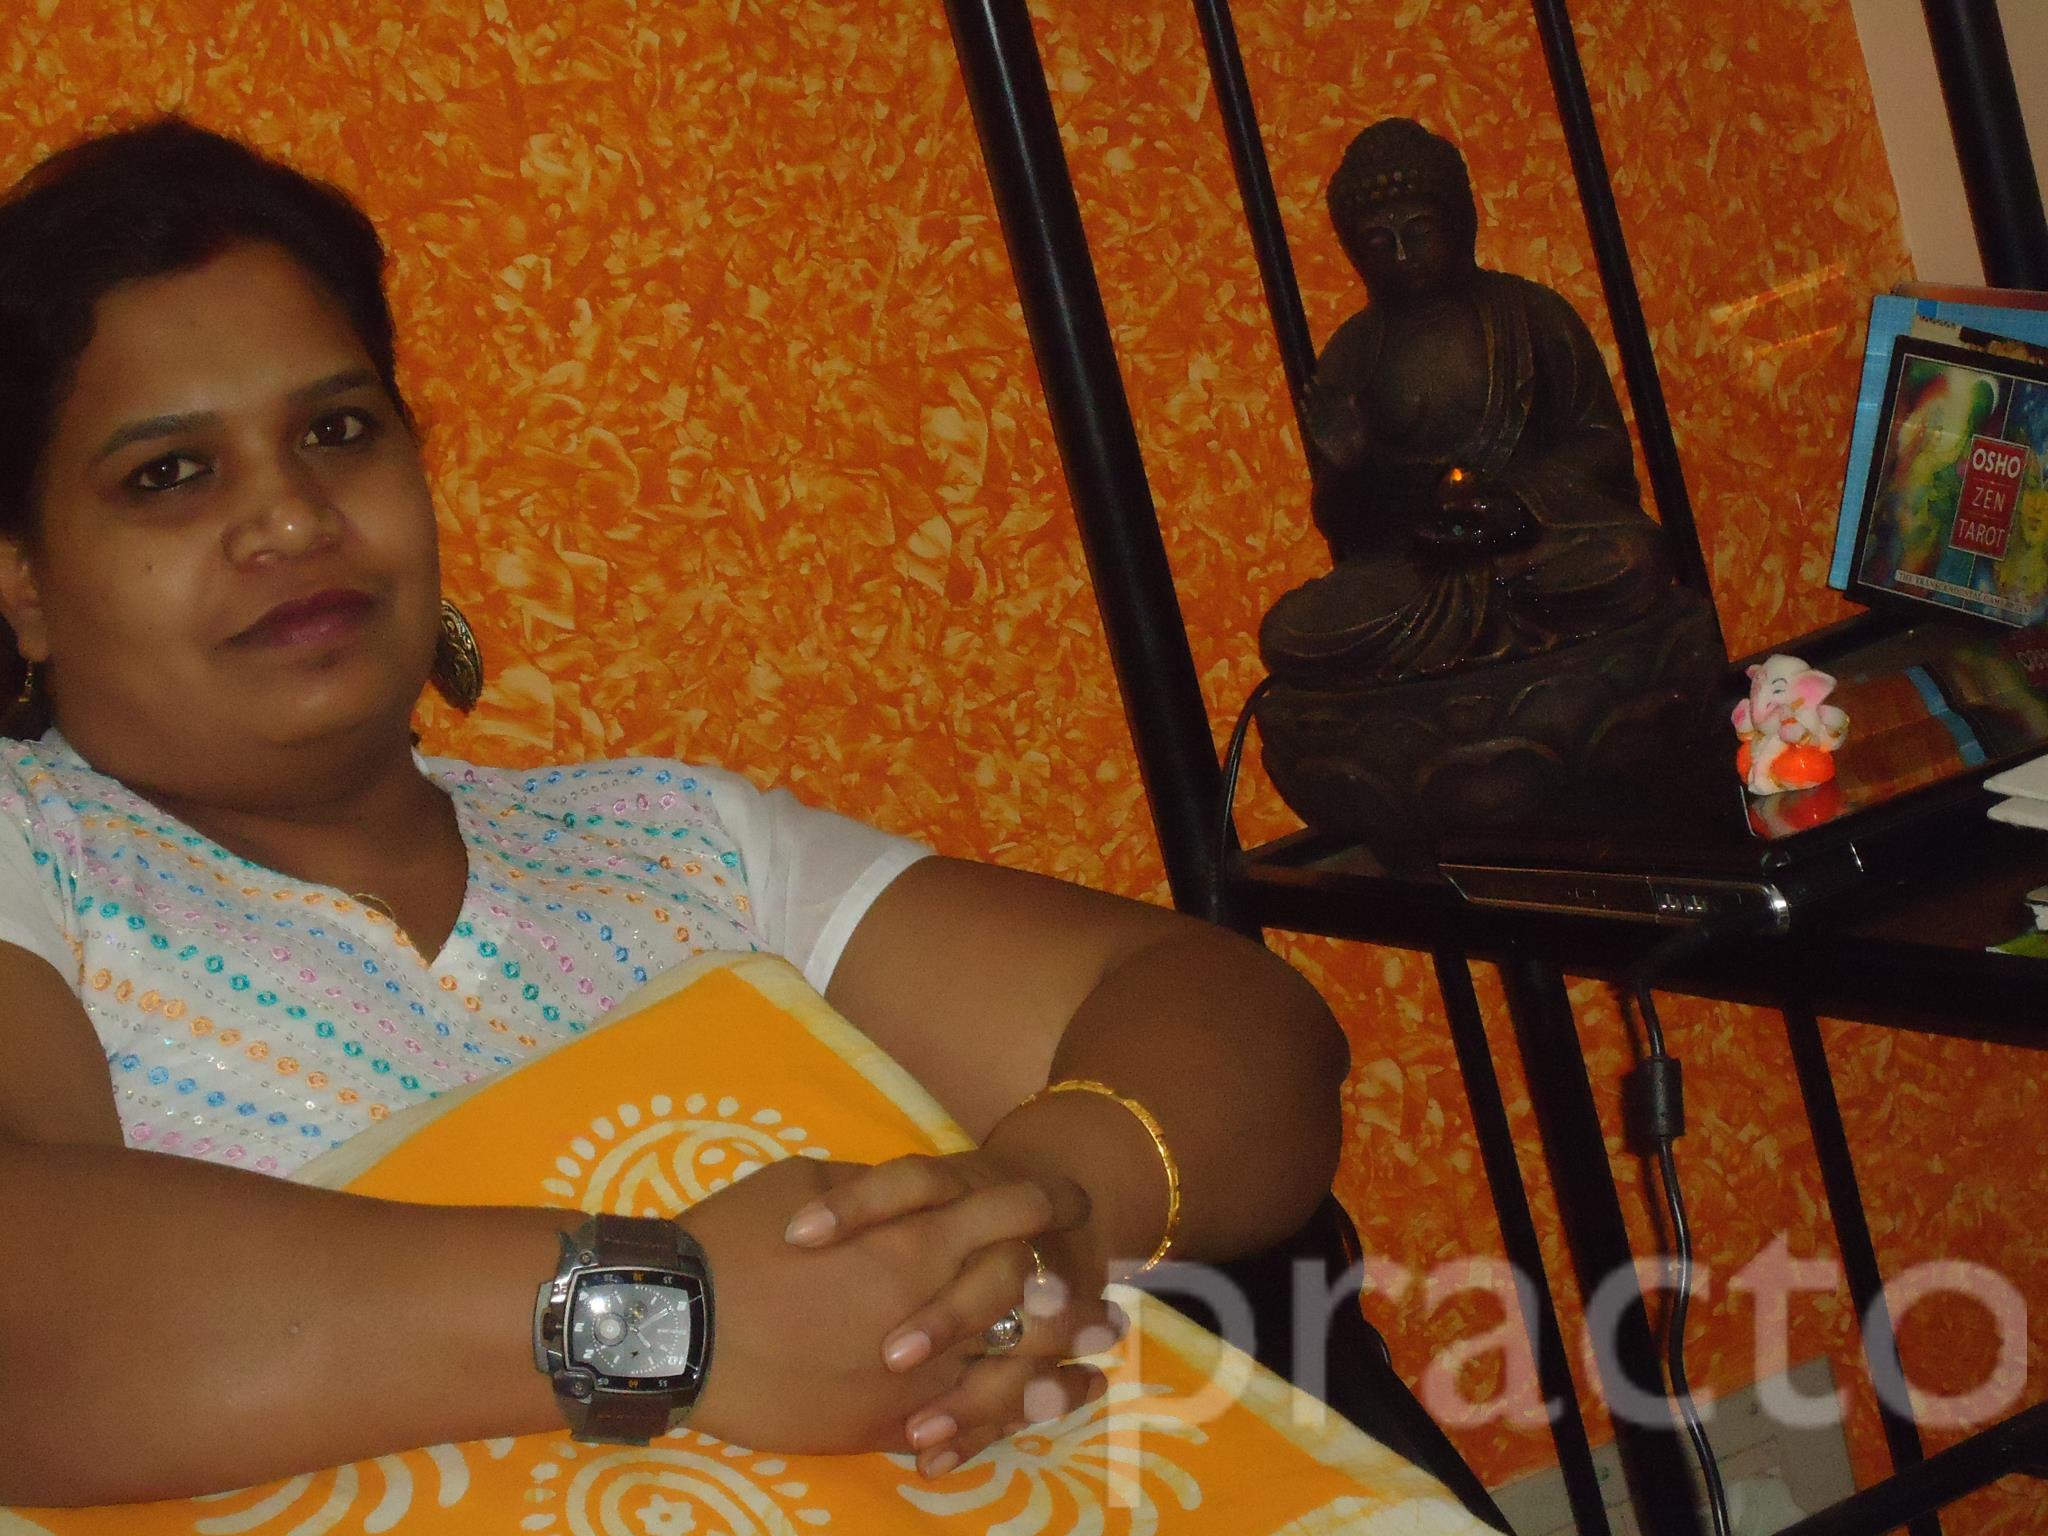 Ms. C.Bhagya Yalkar Savyell - Psychologist